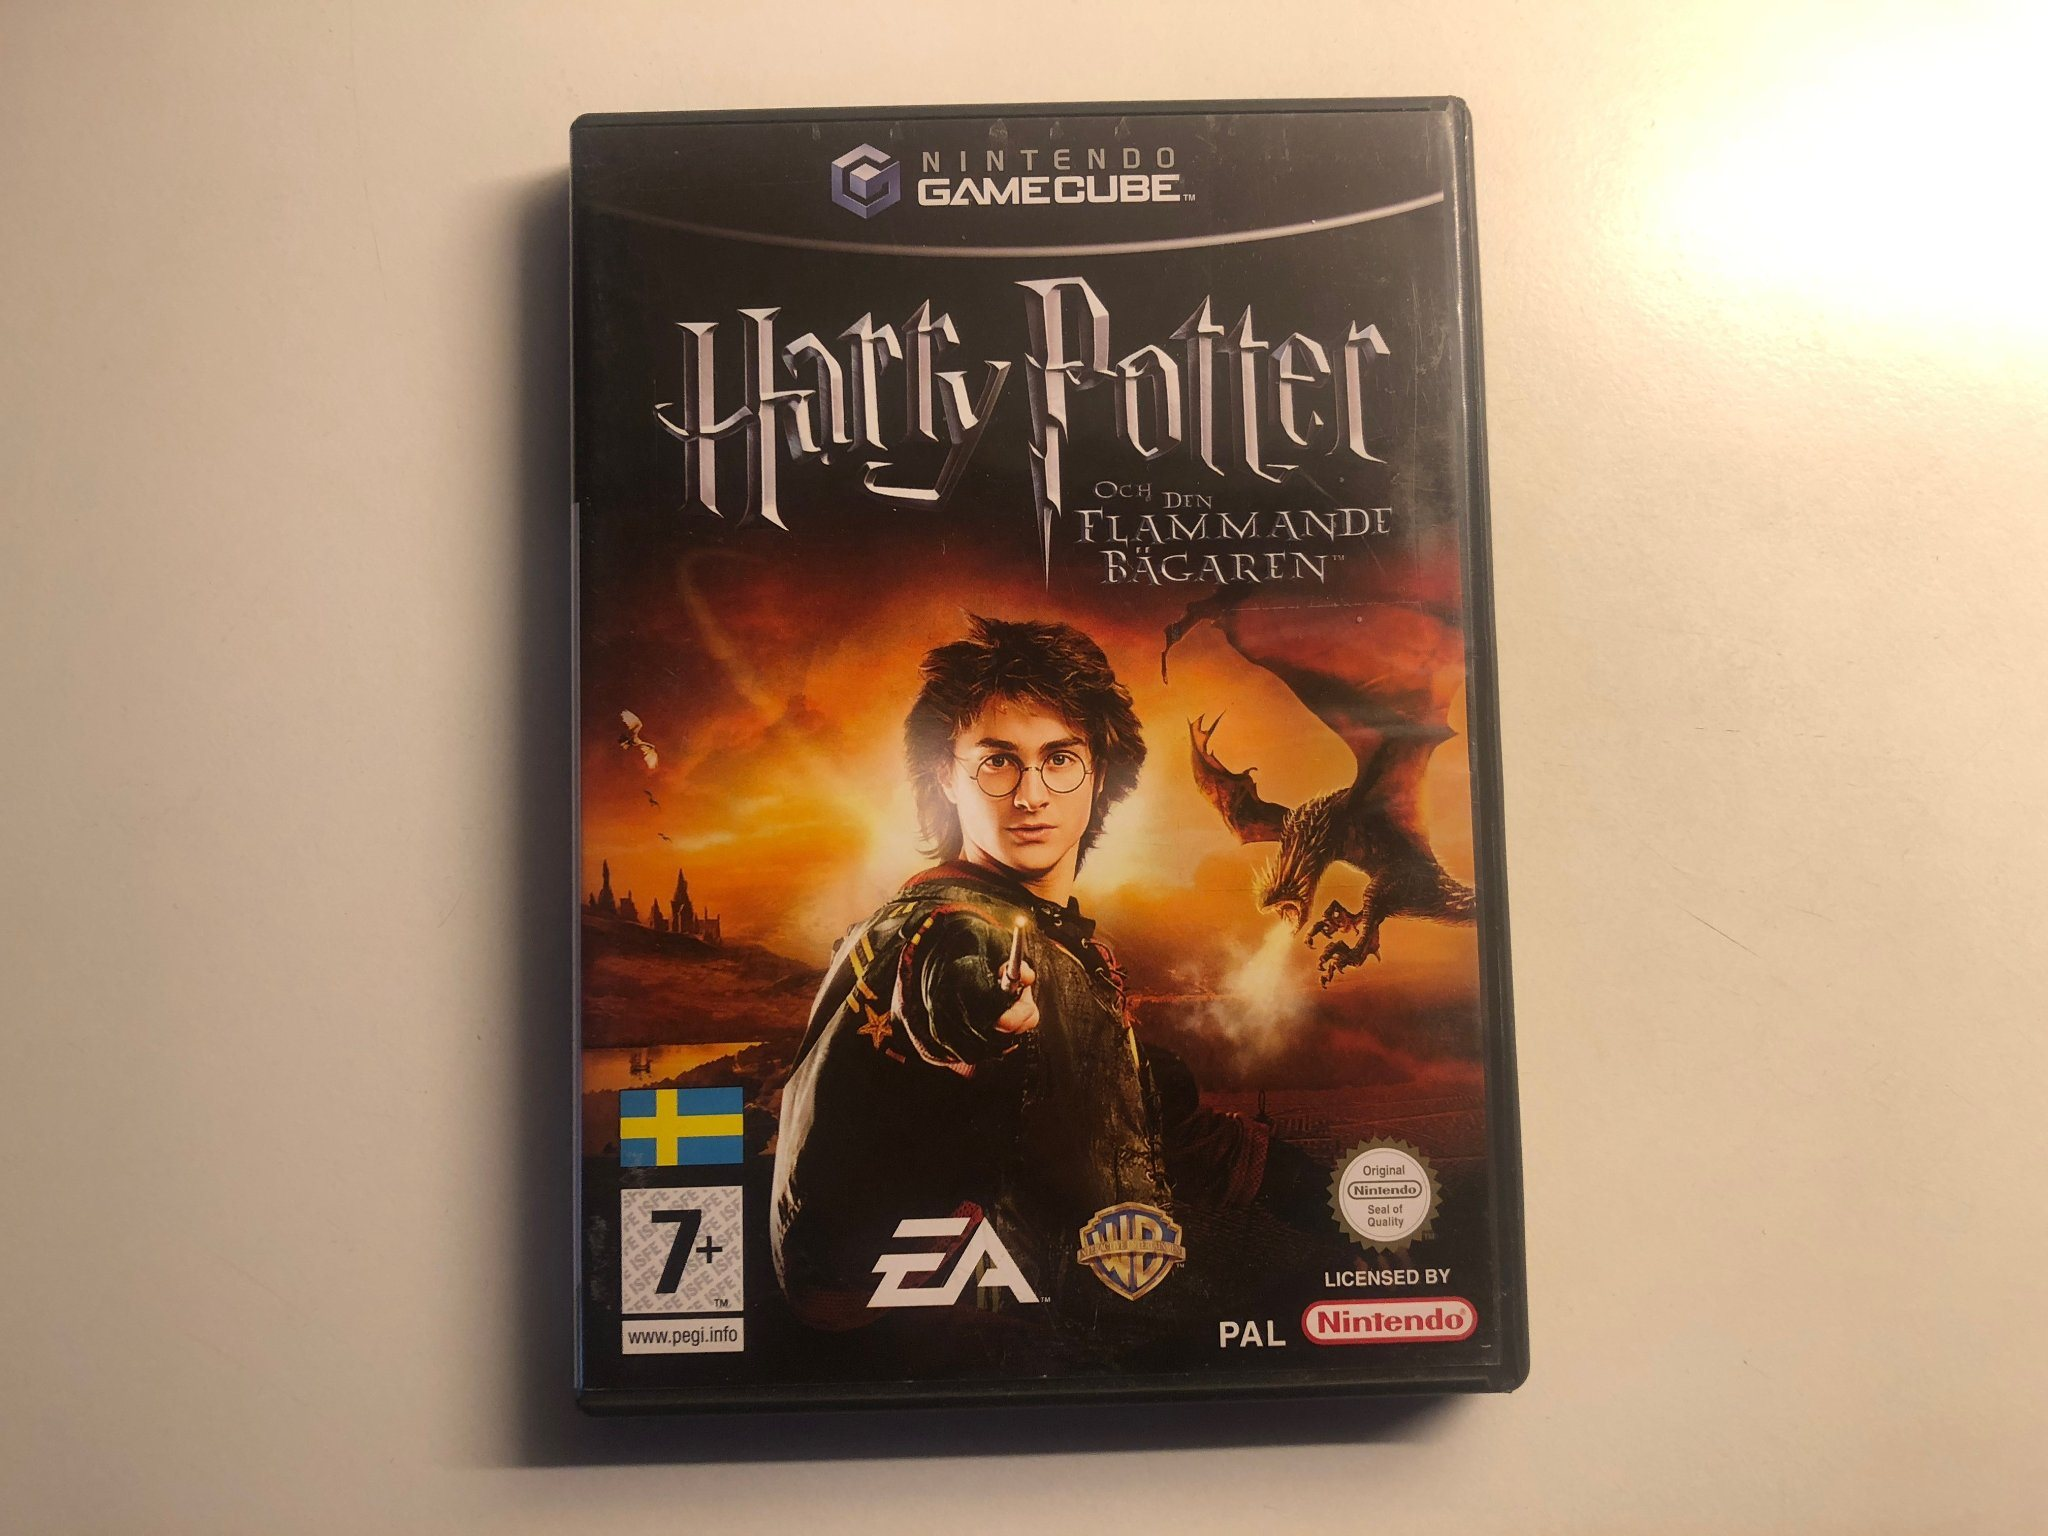 Harry Potter och den flammande b-garen